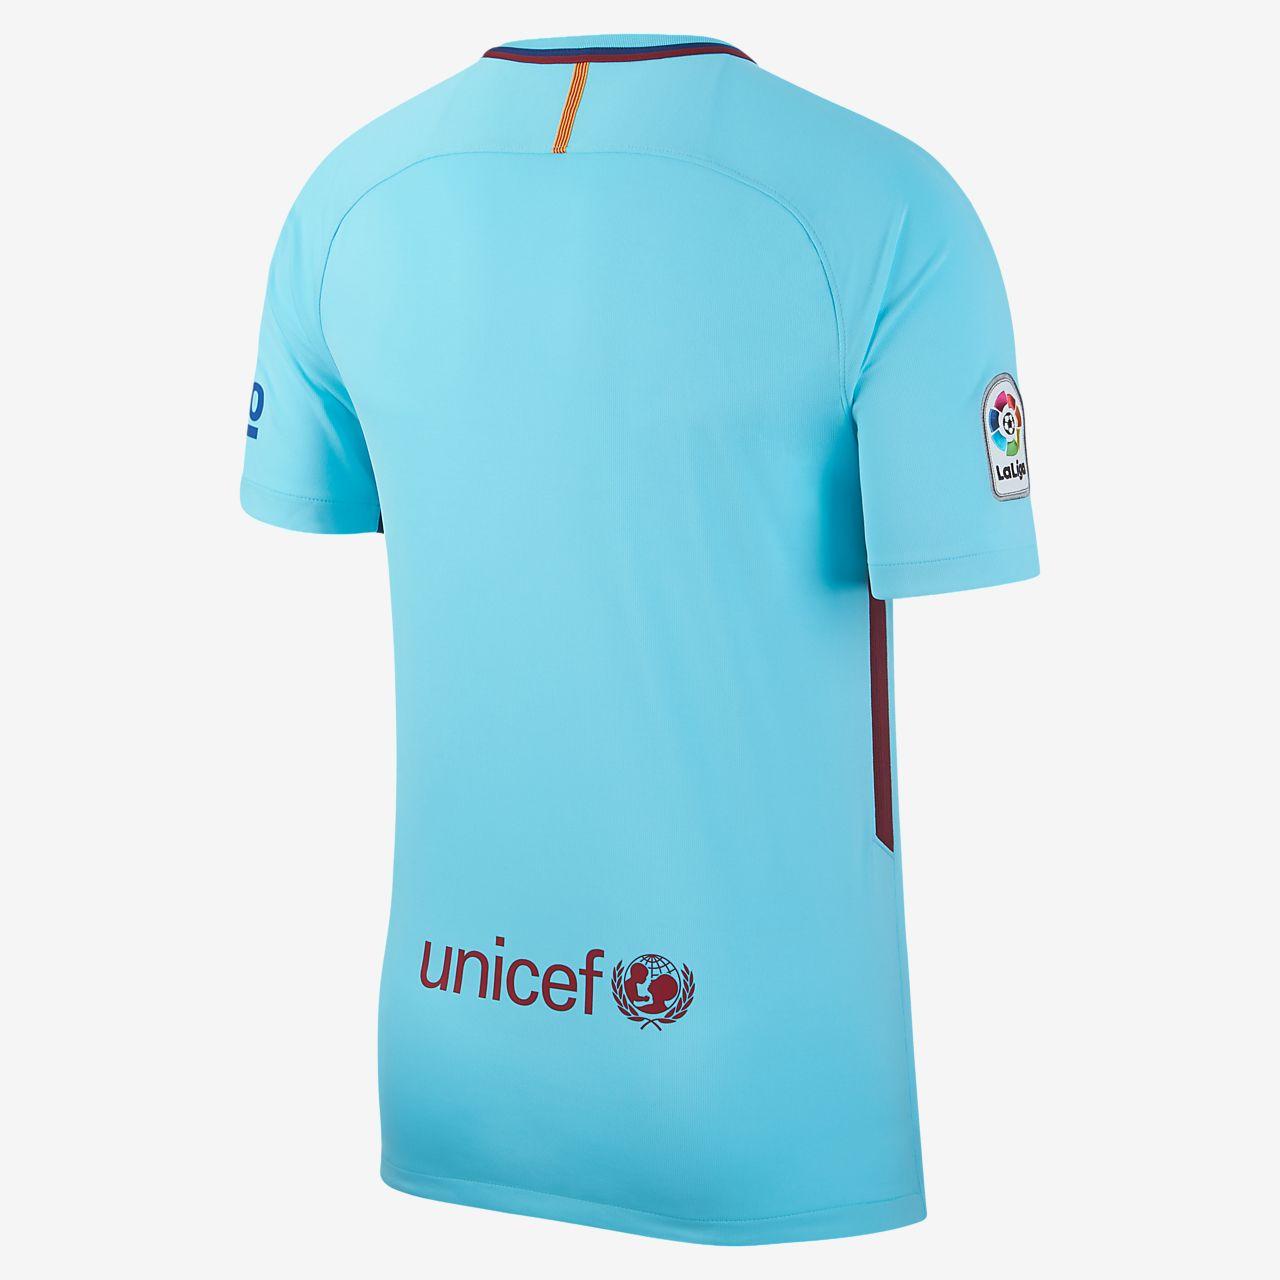 ... 2017/18 FC Barcelona Stadium Away Men's Football Shirt